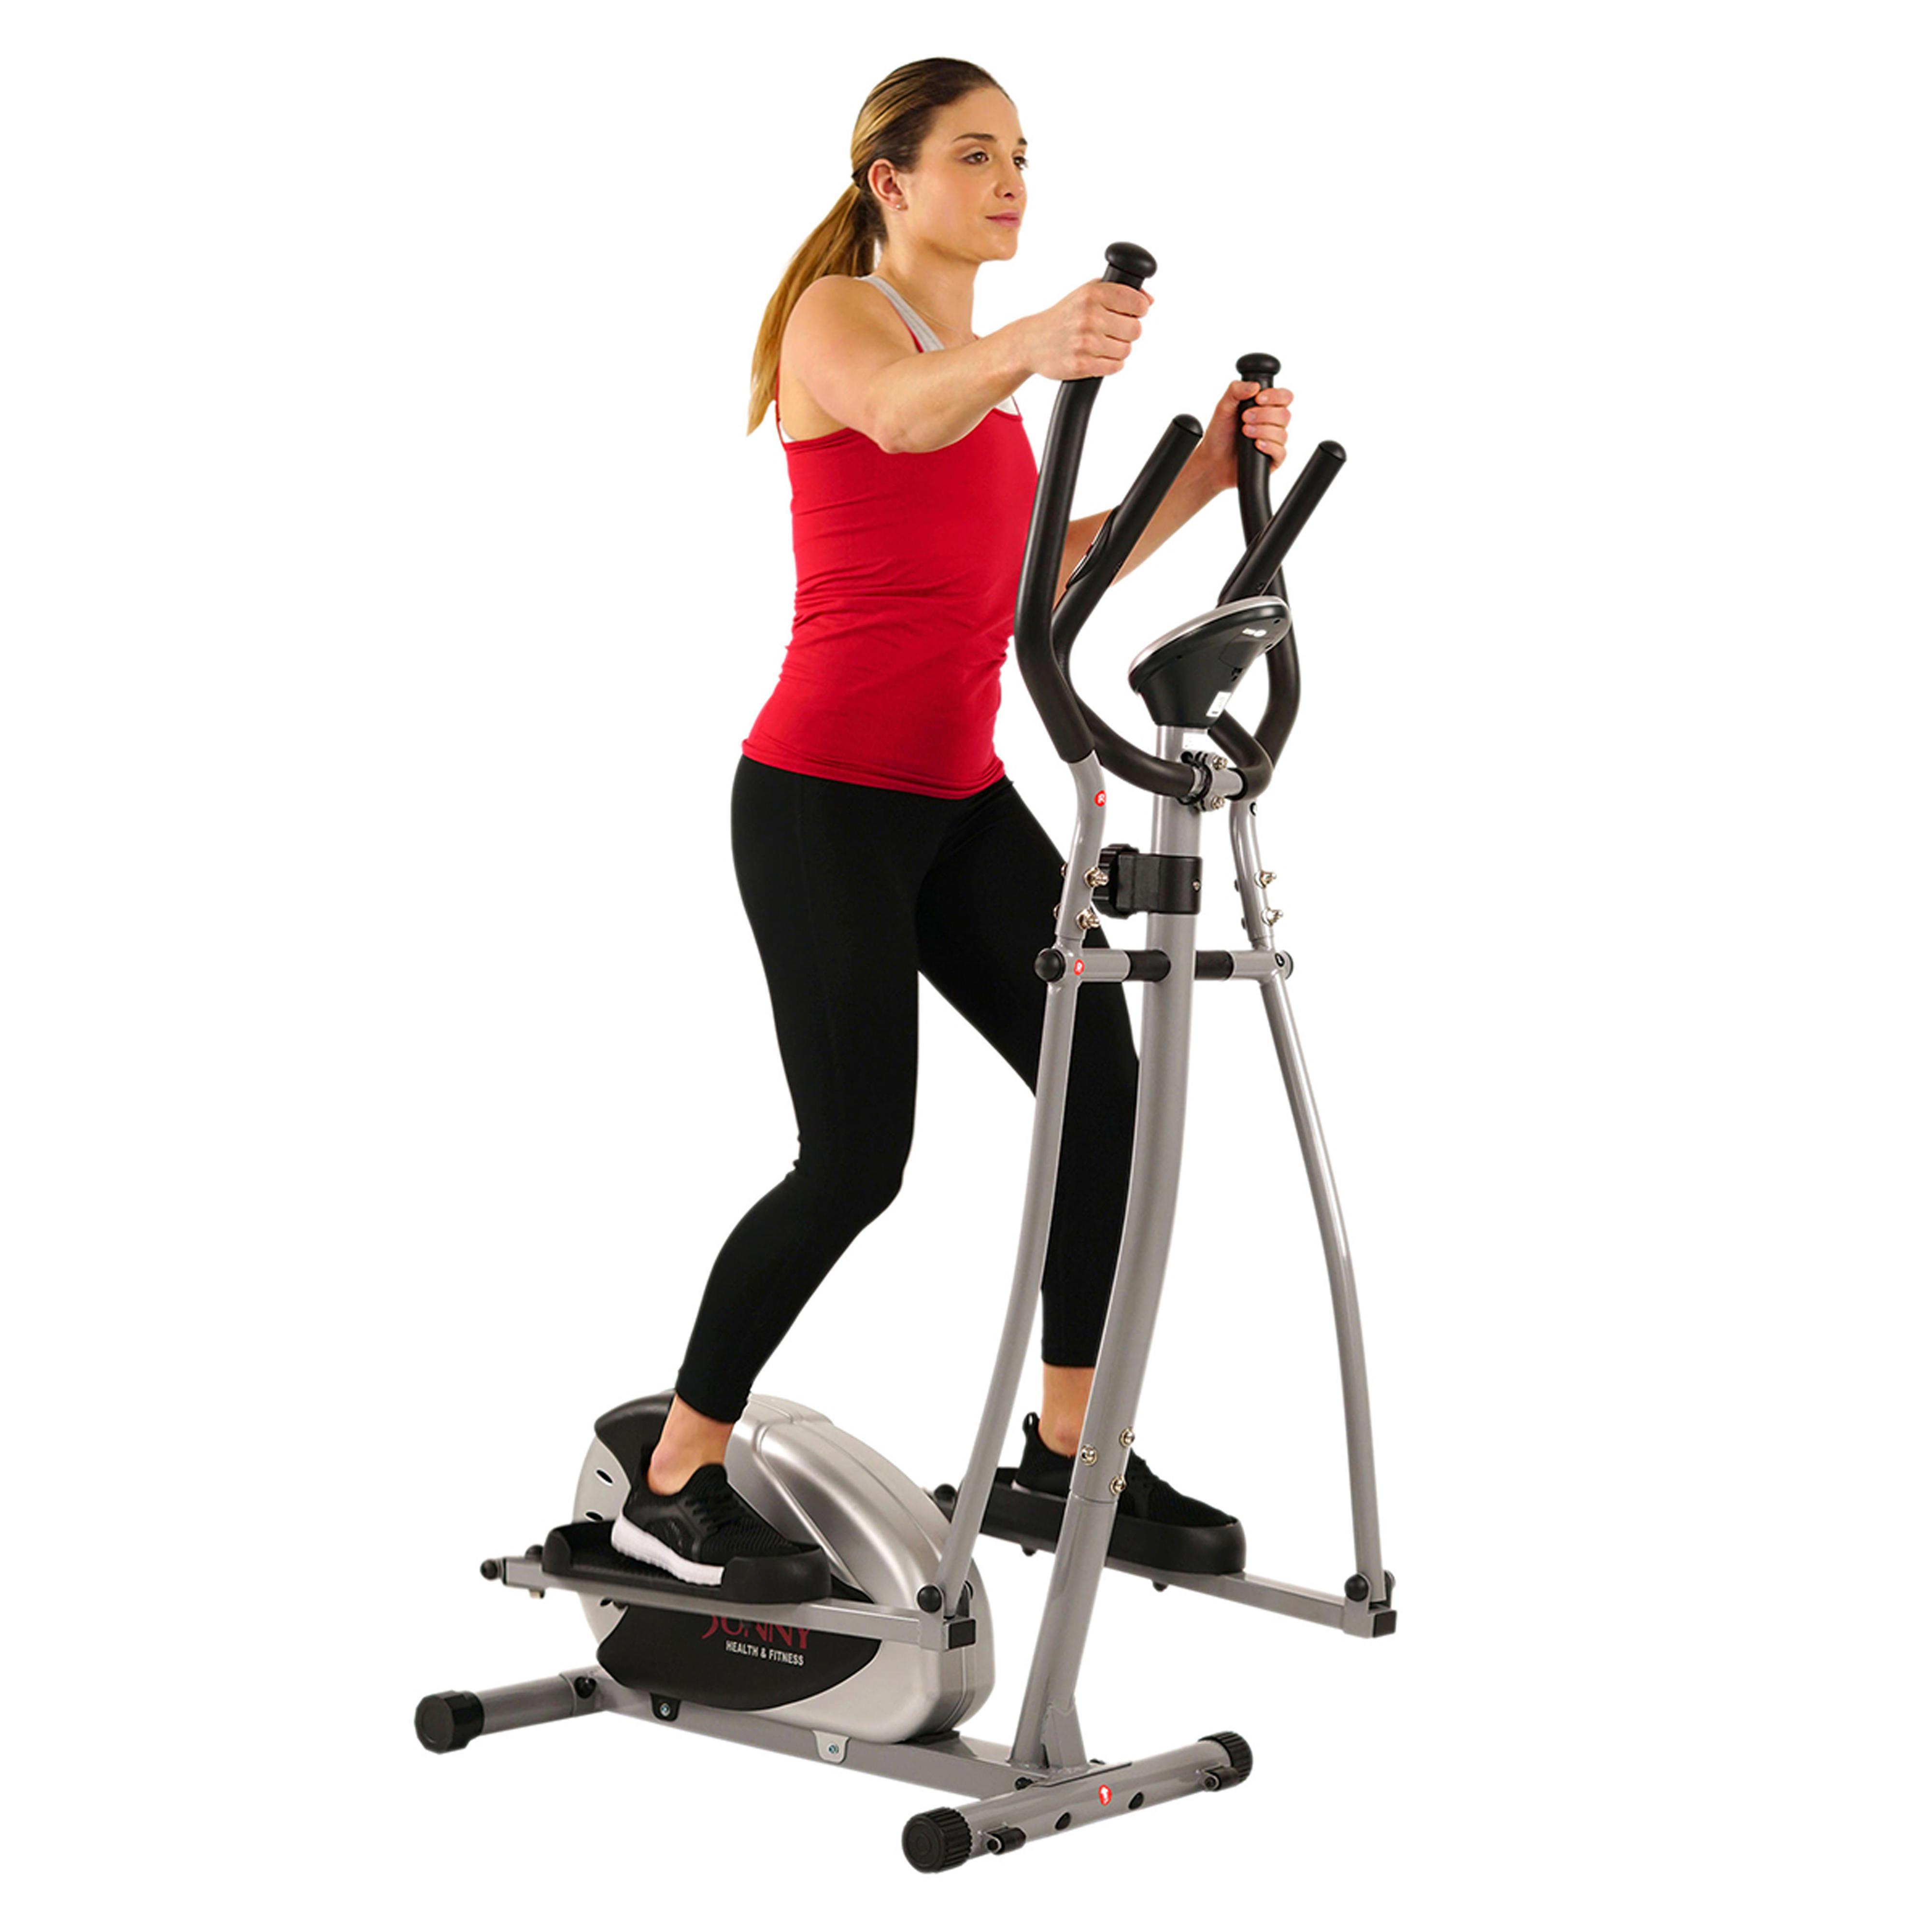 Sunny Health & Fitness SF-E905 Magnetic Elliptical